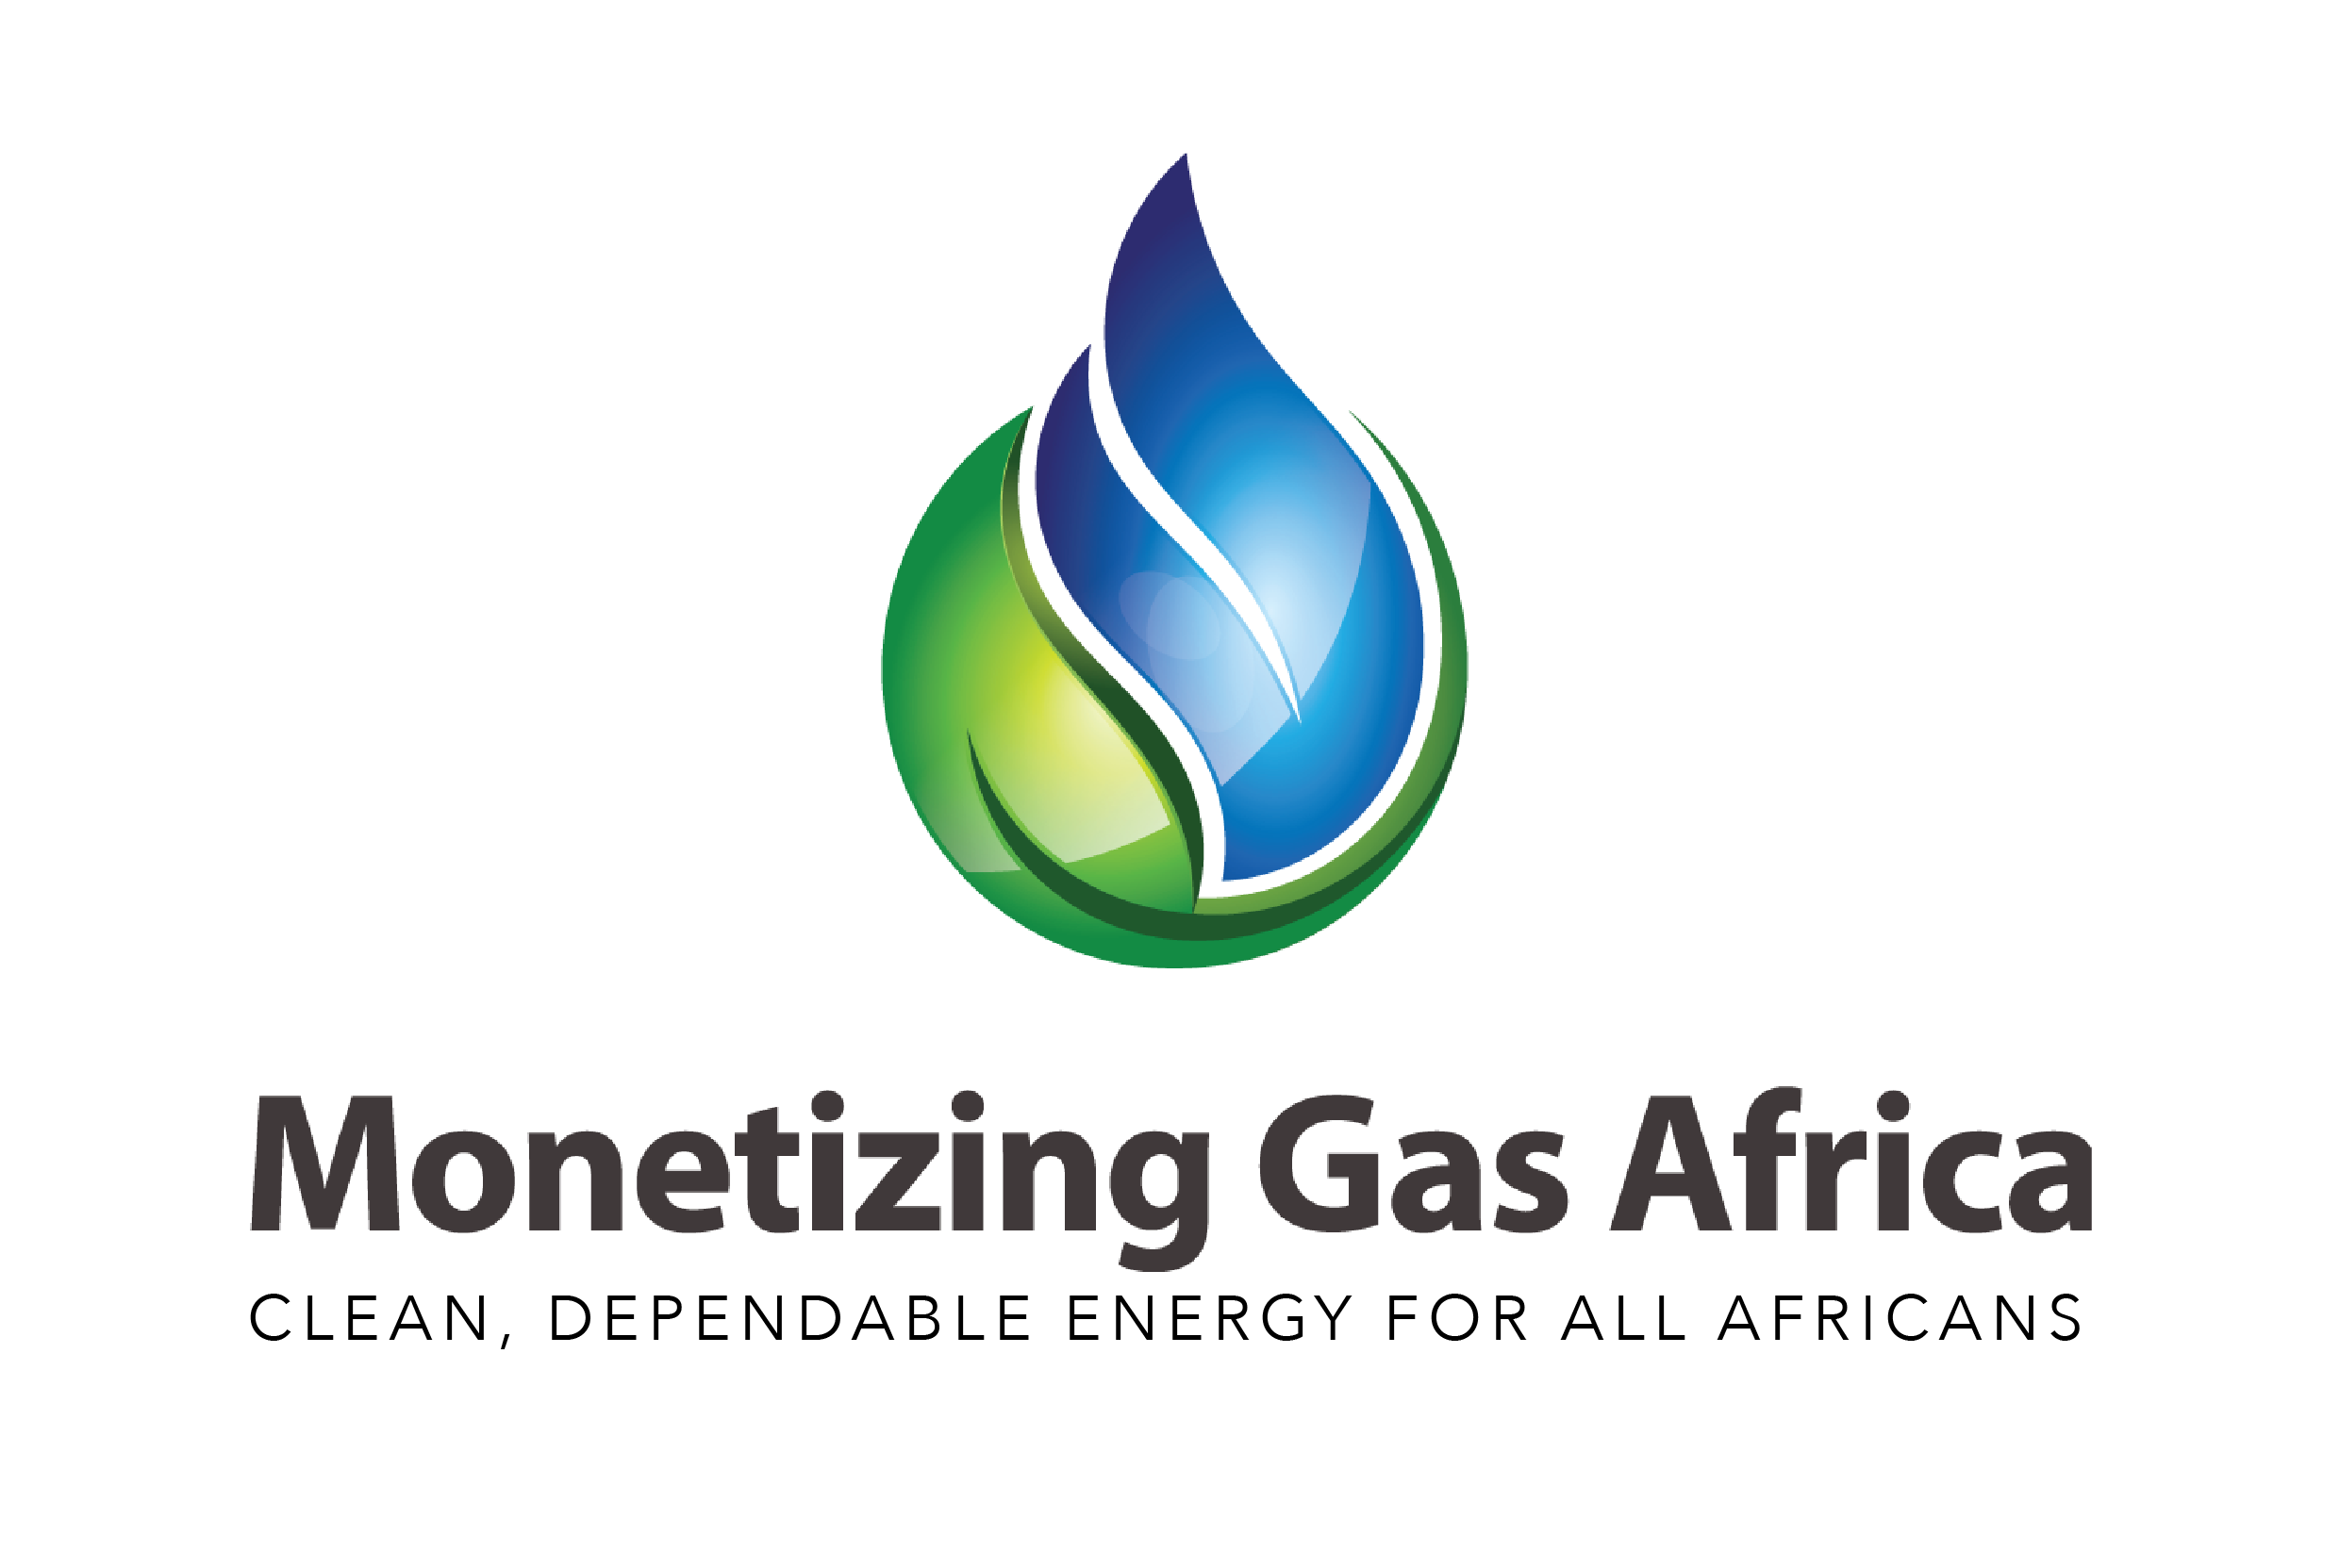 Monetizing Gas Africa